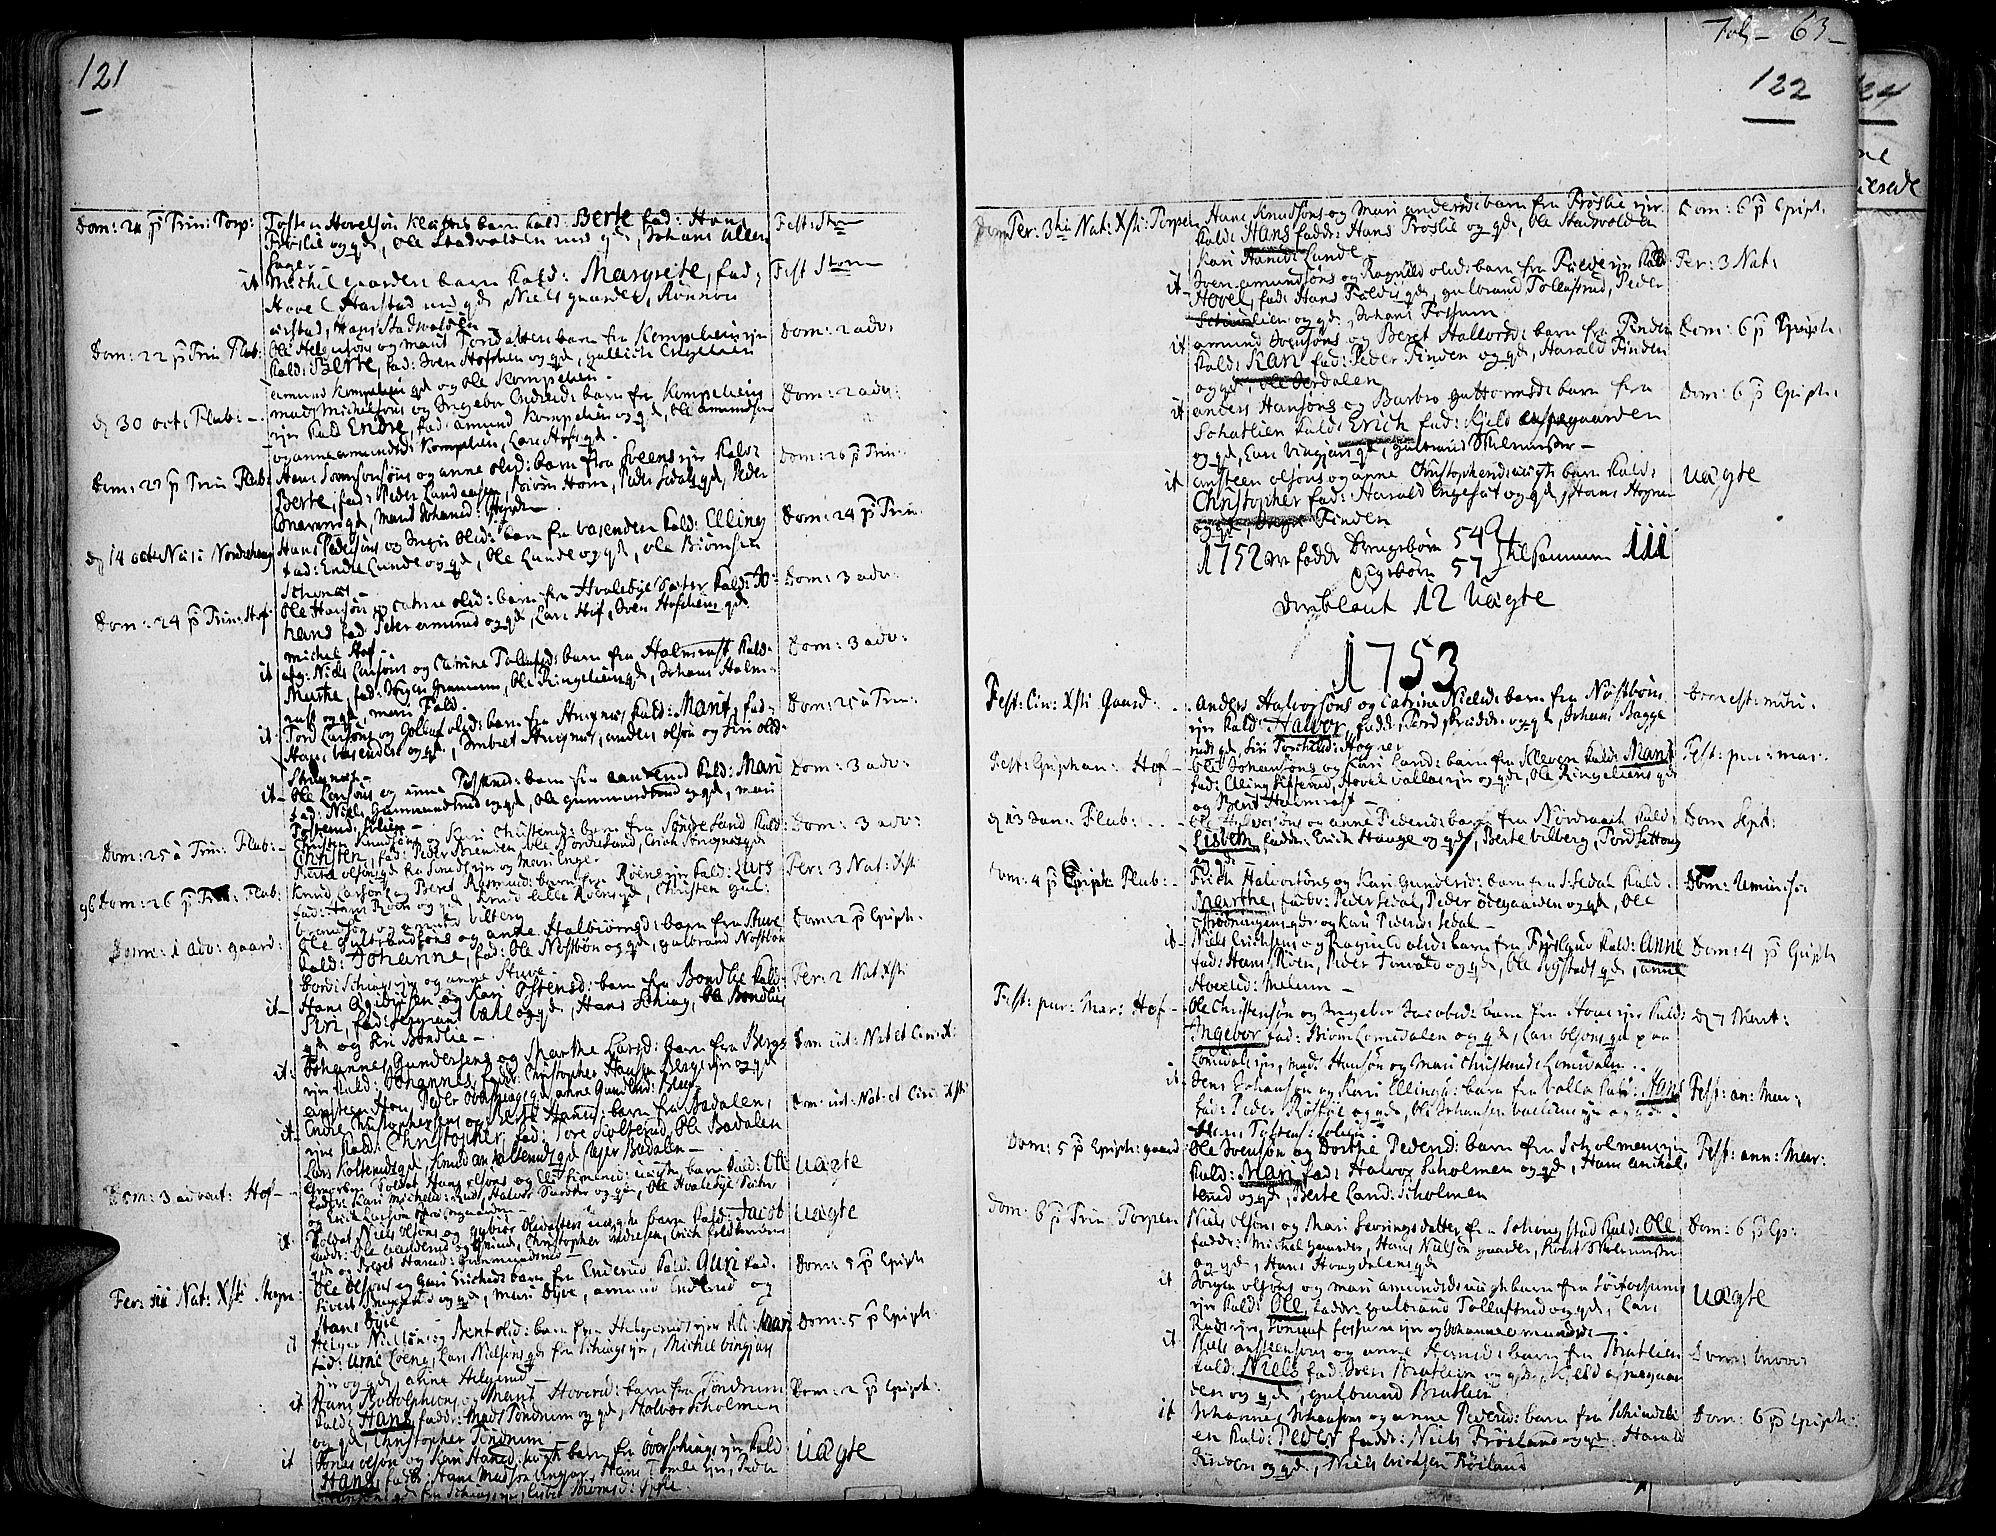 SAH, Land prestekontor, Ministerialbok nr. 2, 1733-1764, s. 121-122